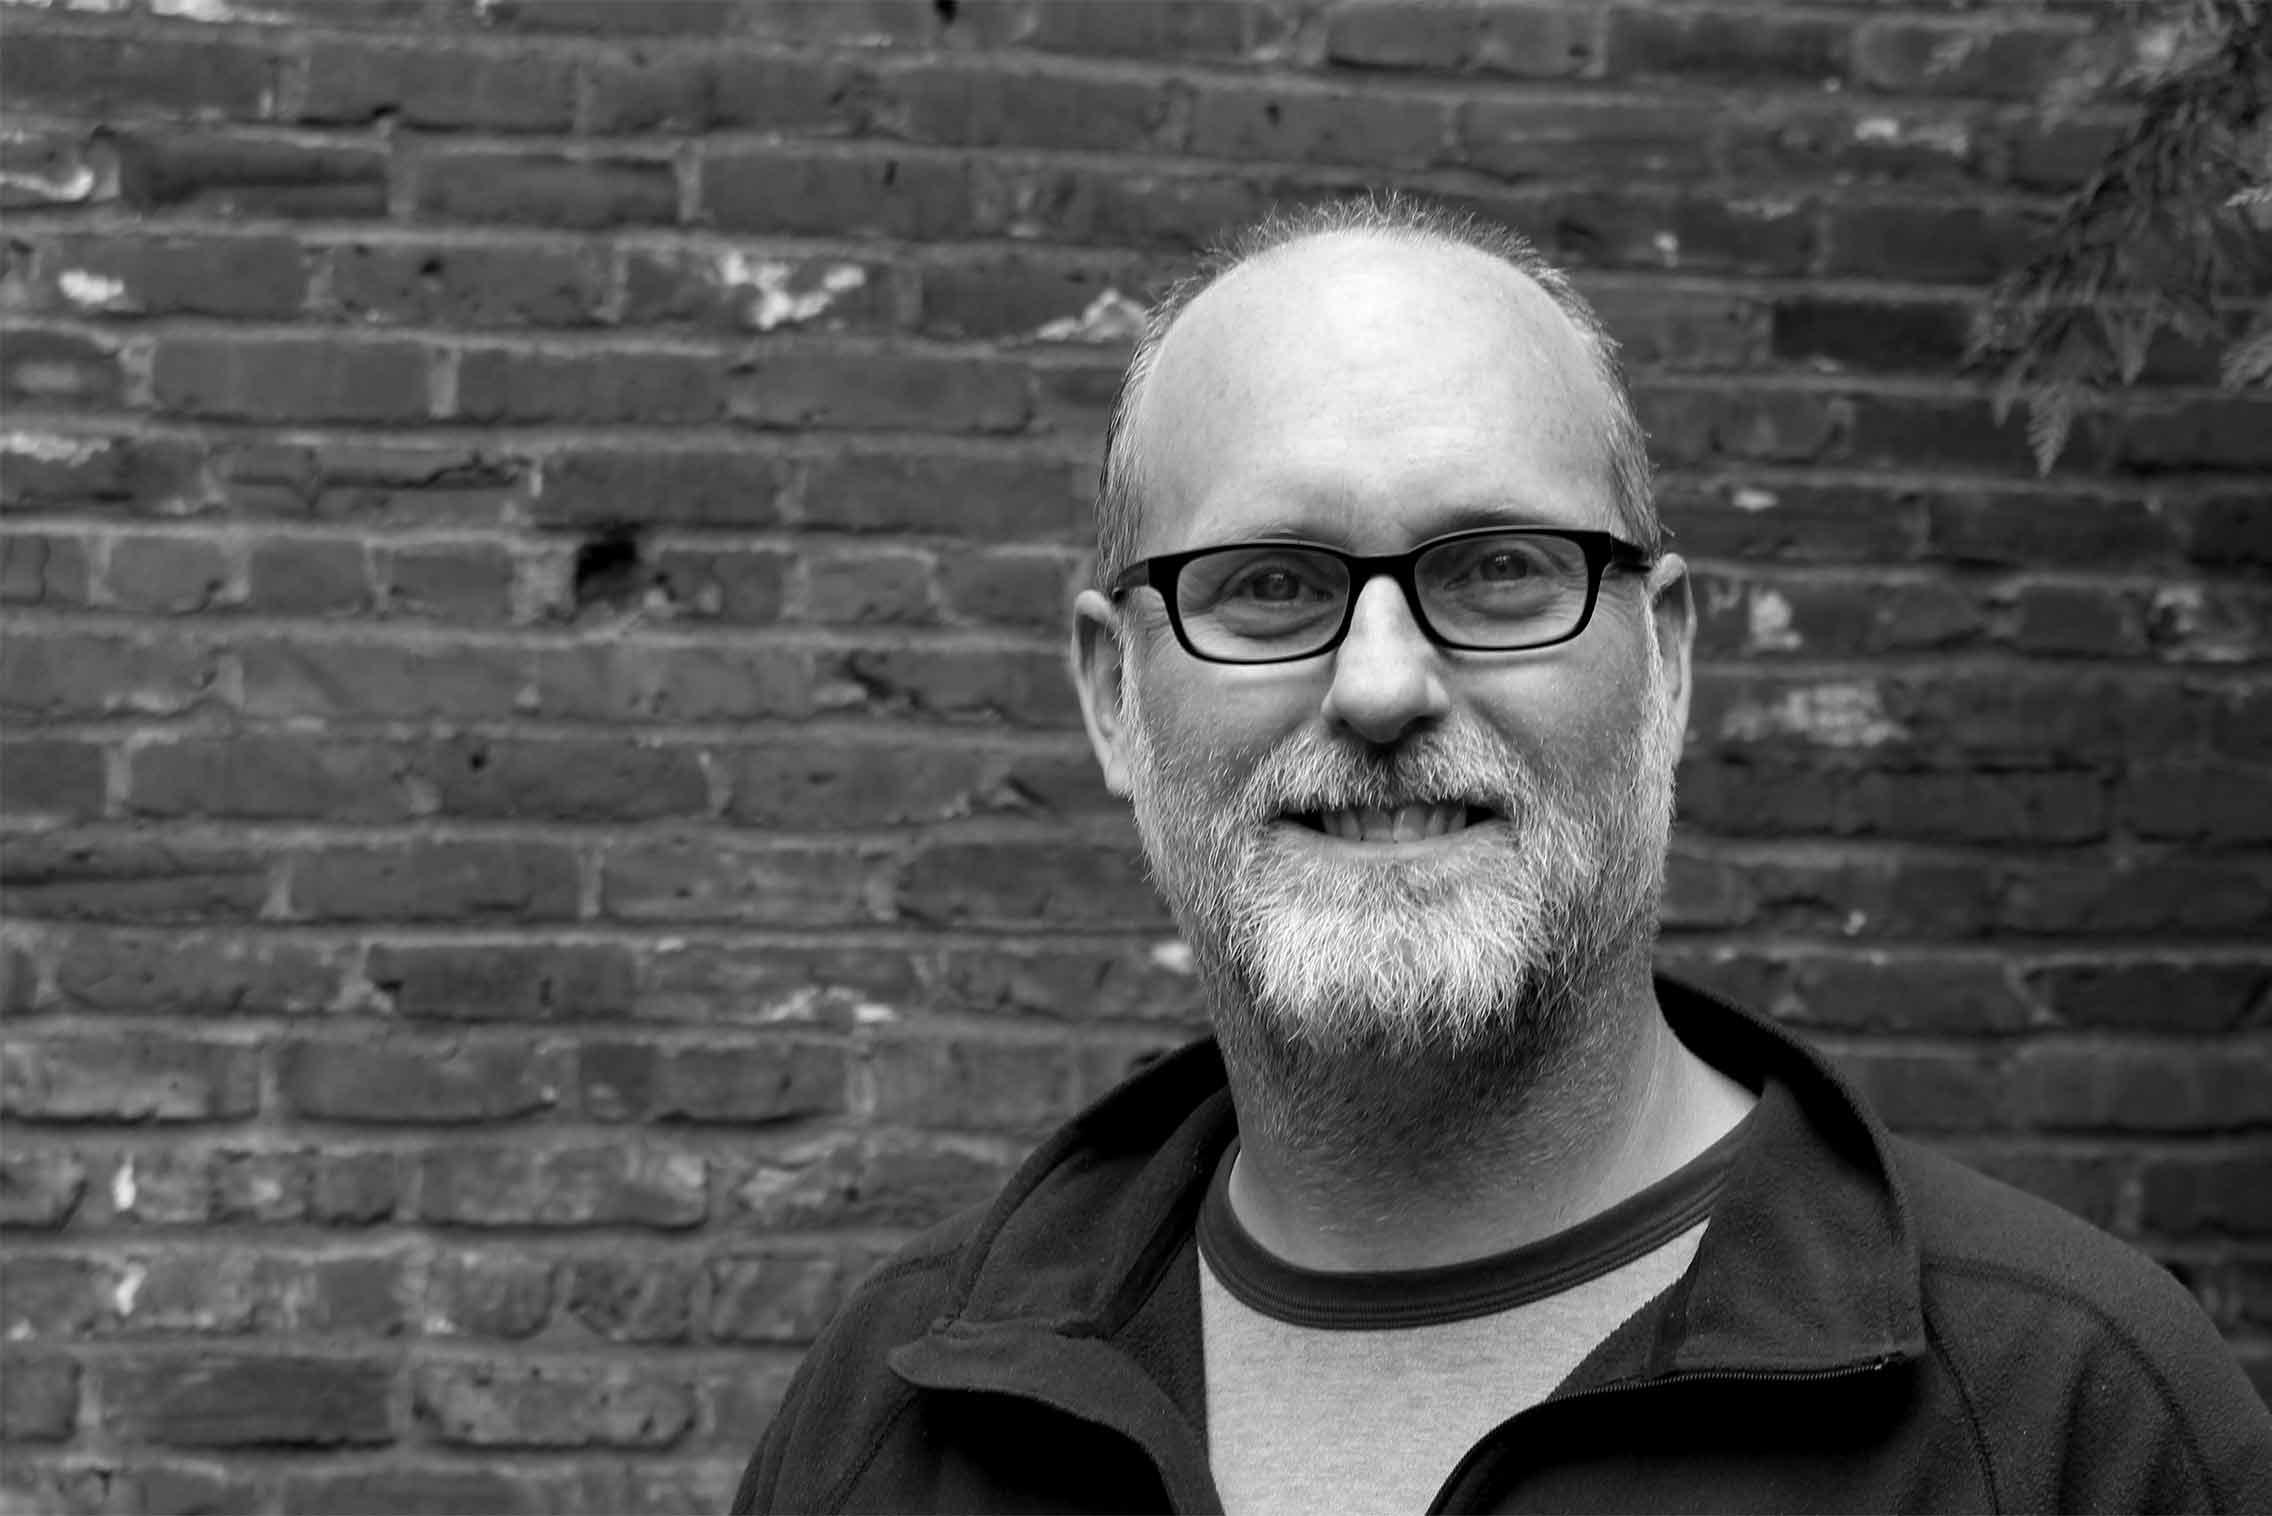 Black and white headshot of Andrew Hedges.